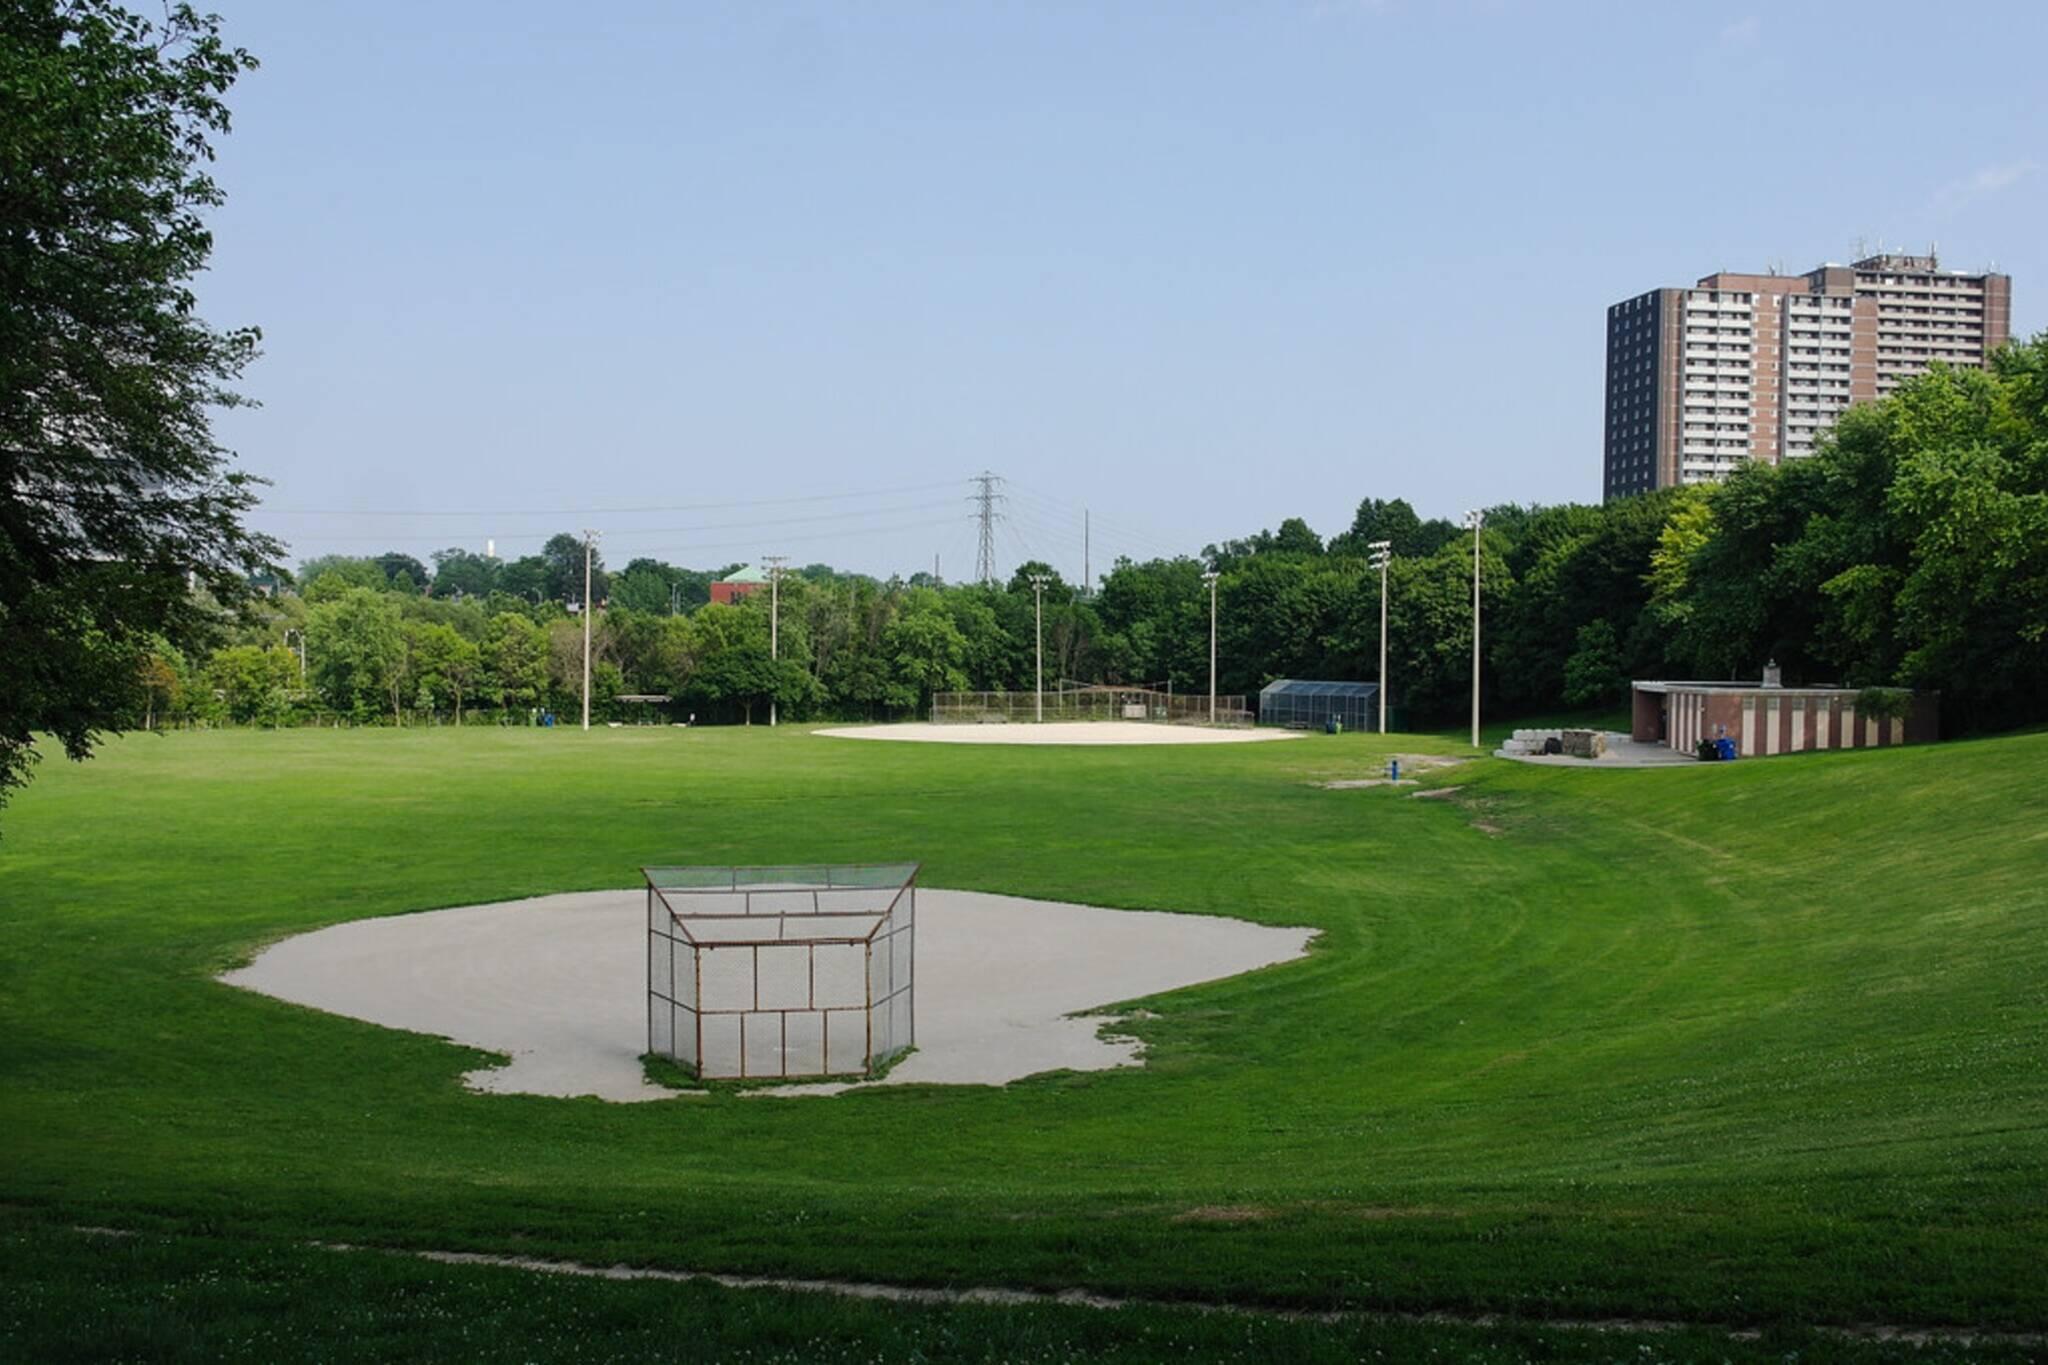 toronto sport fields reopening